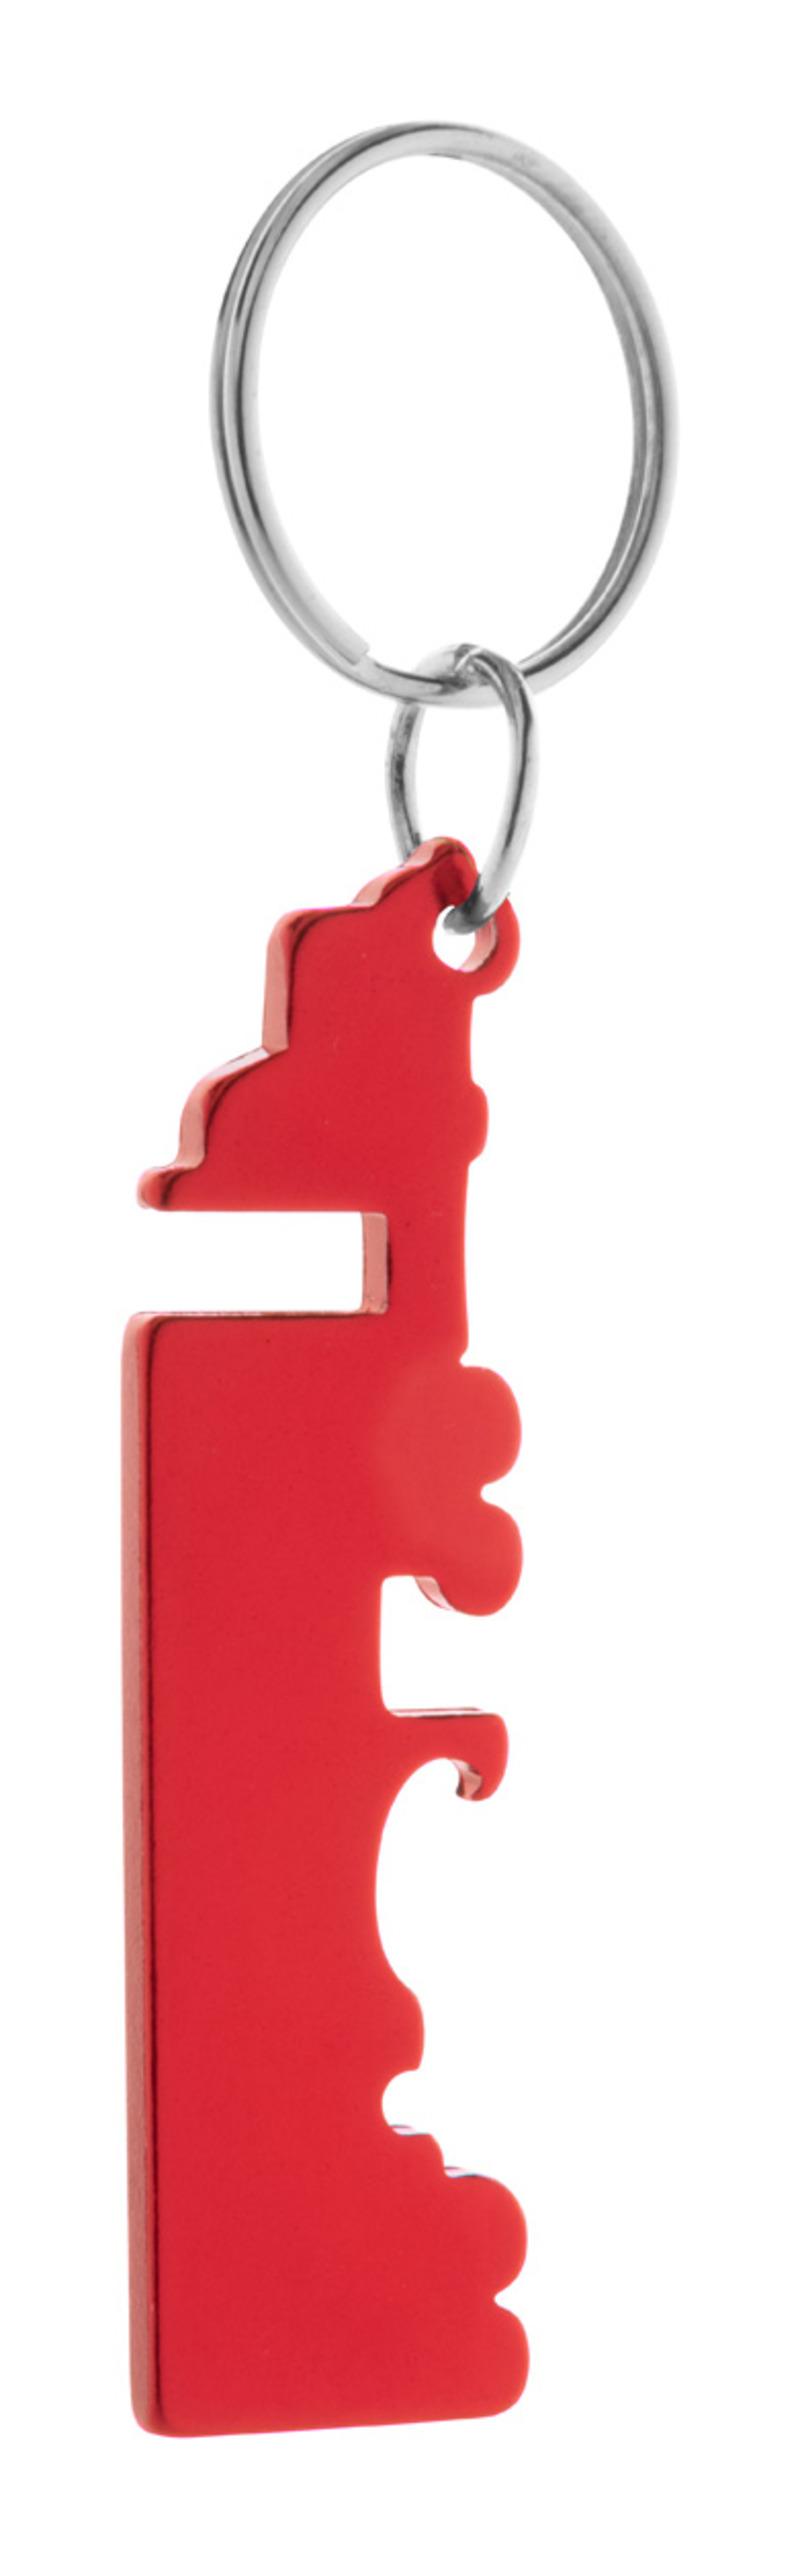 Peterby bottle opener keyring